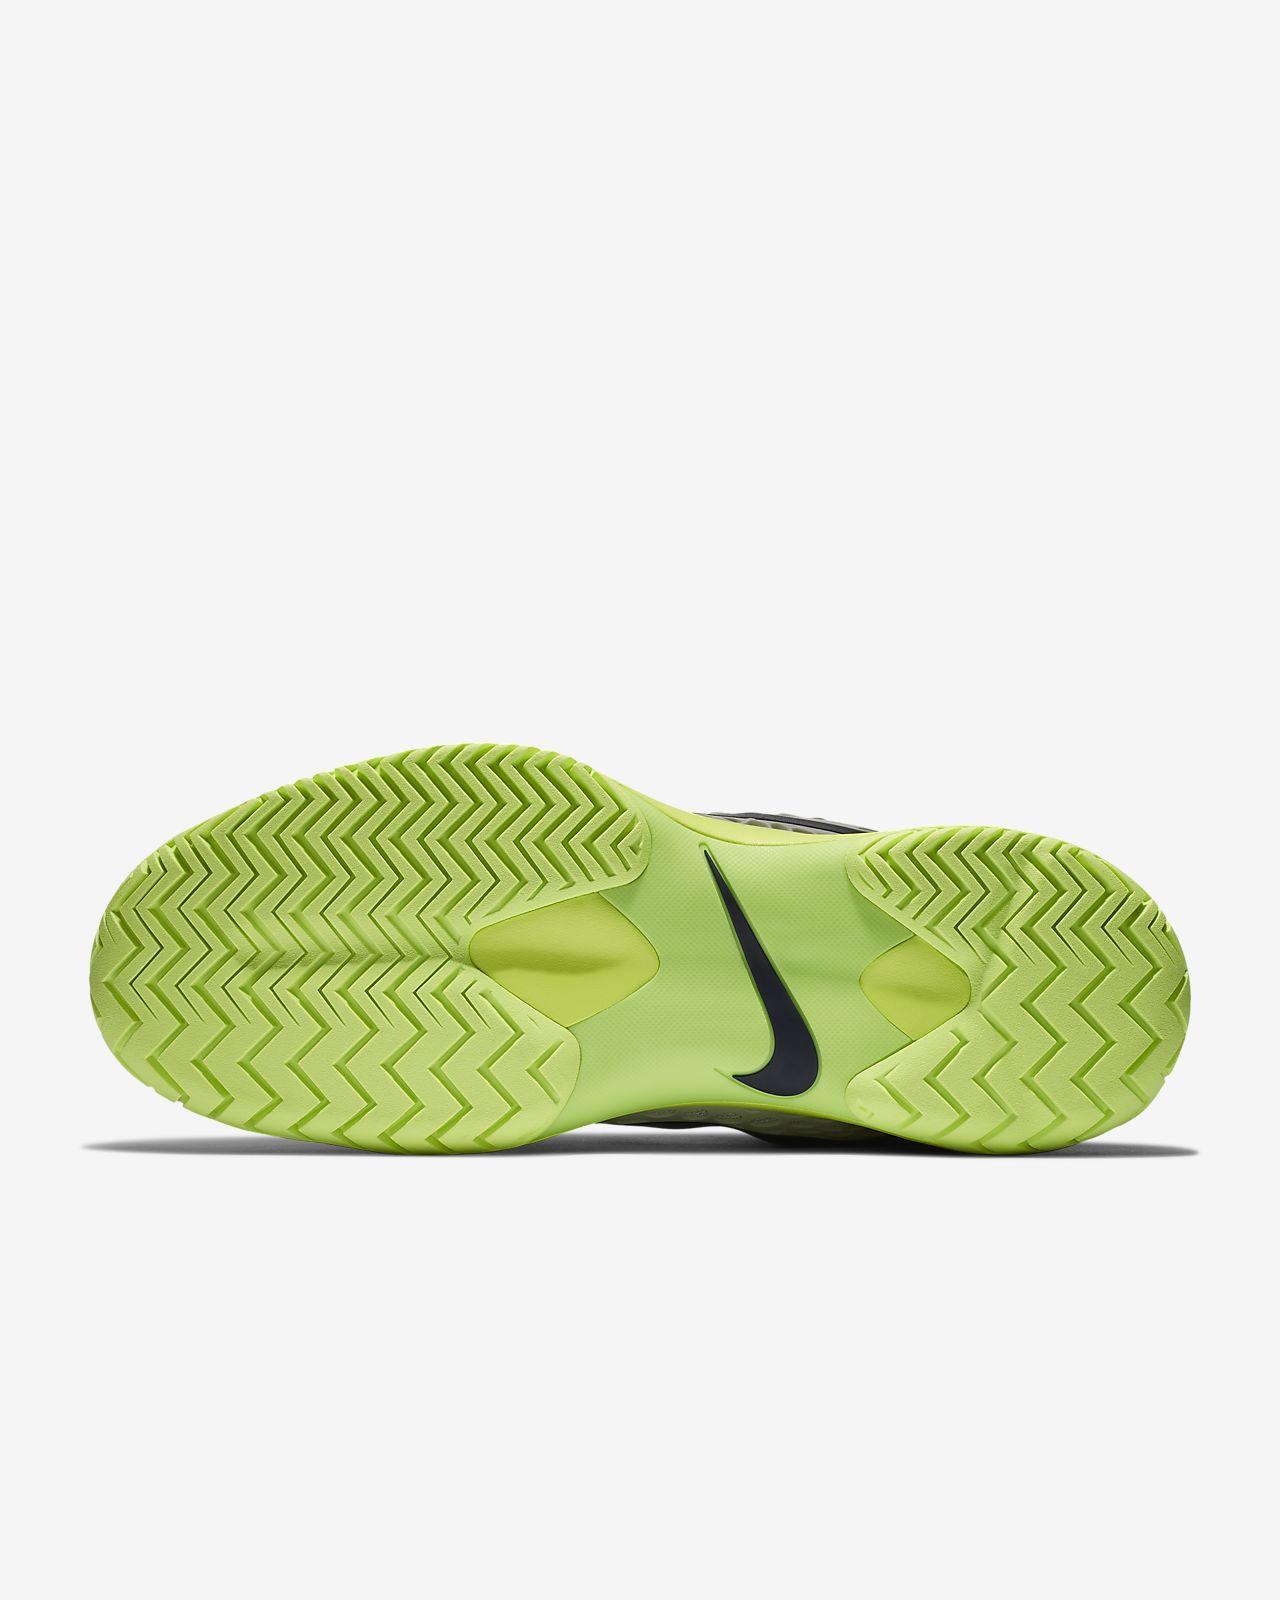 009cfd154d6 Calzado de tenis en cancha dura para hombre NikeCourt Zoom Cage 3 ...